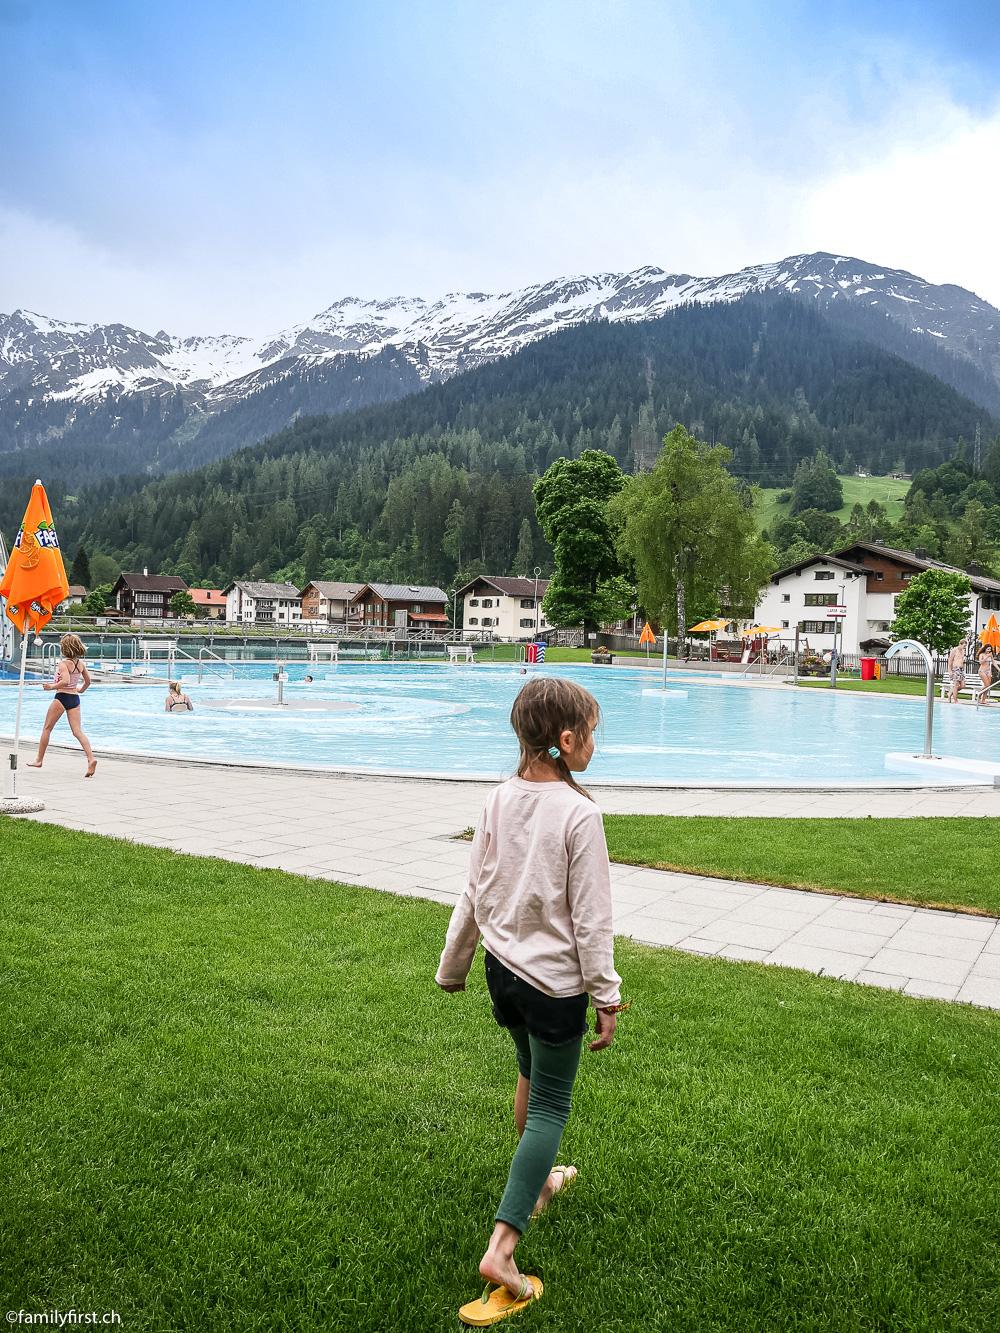 Arena Strandbad Klosters mit Kindern